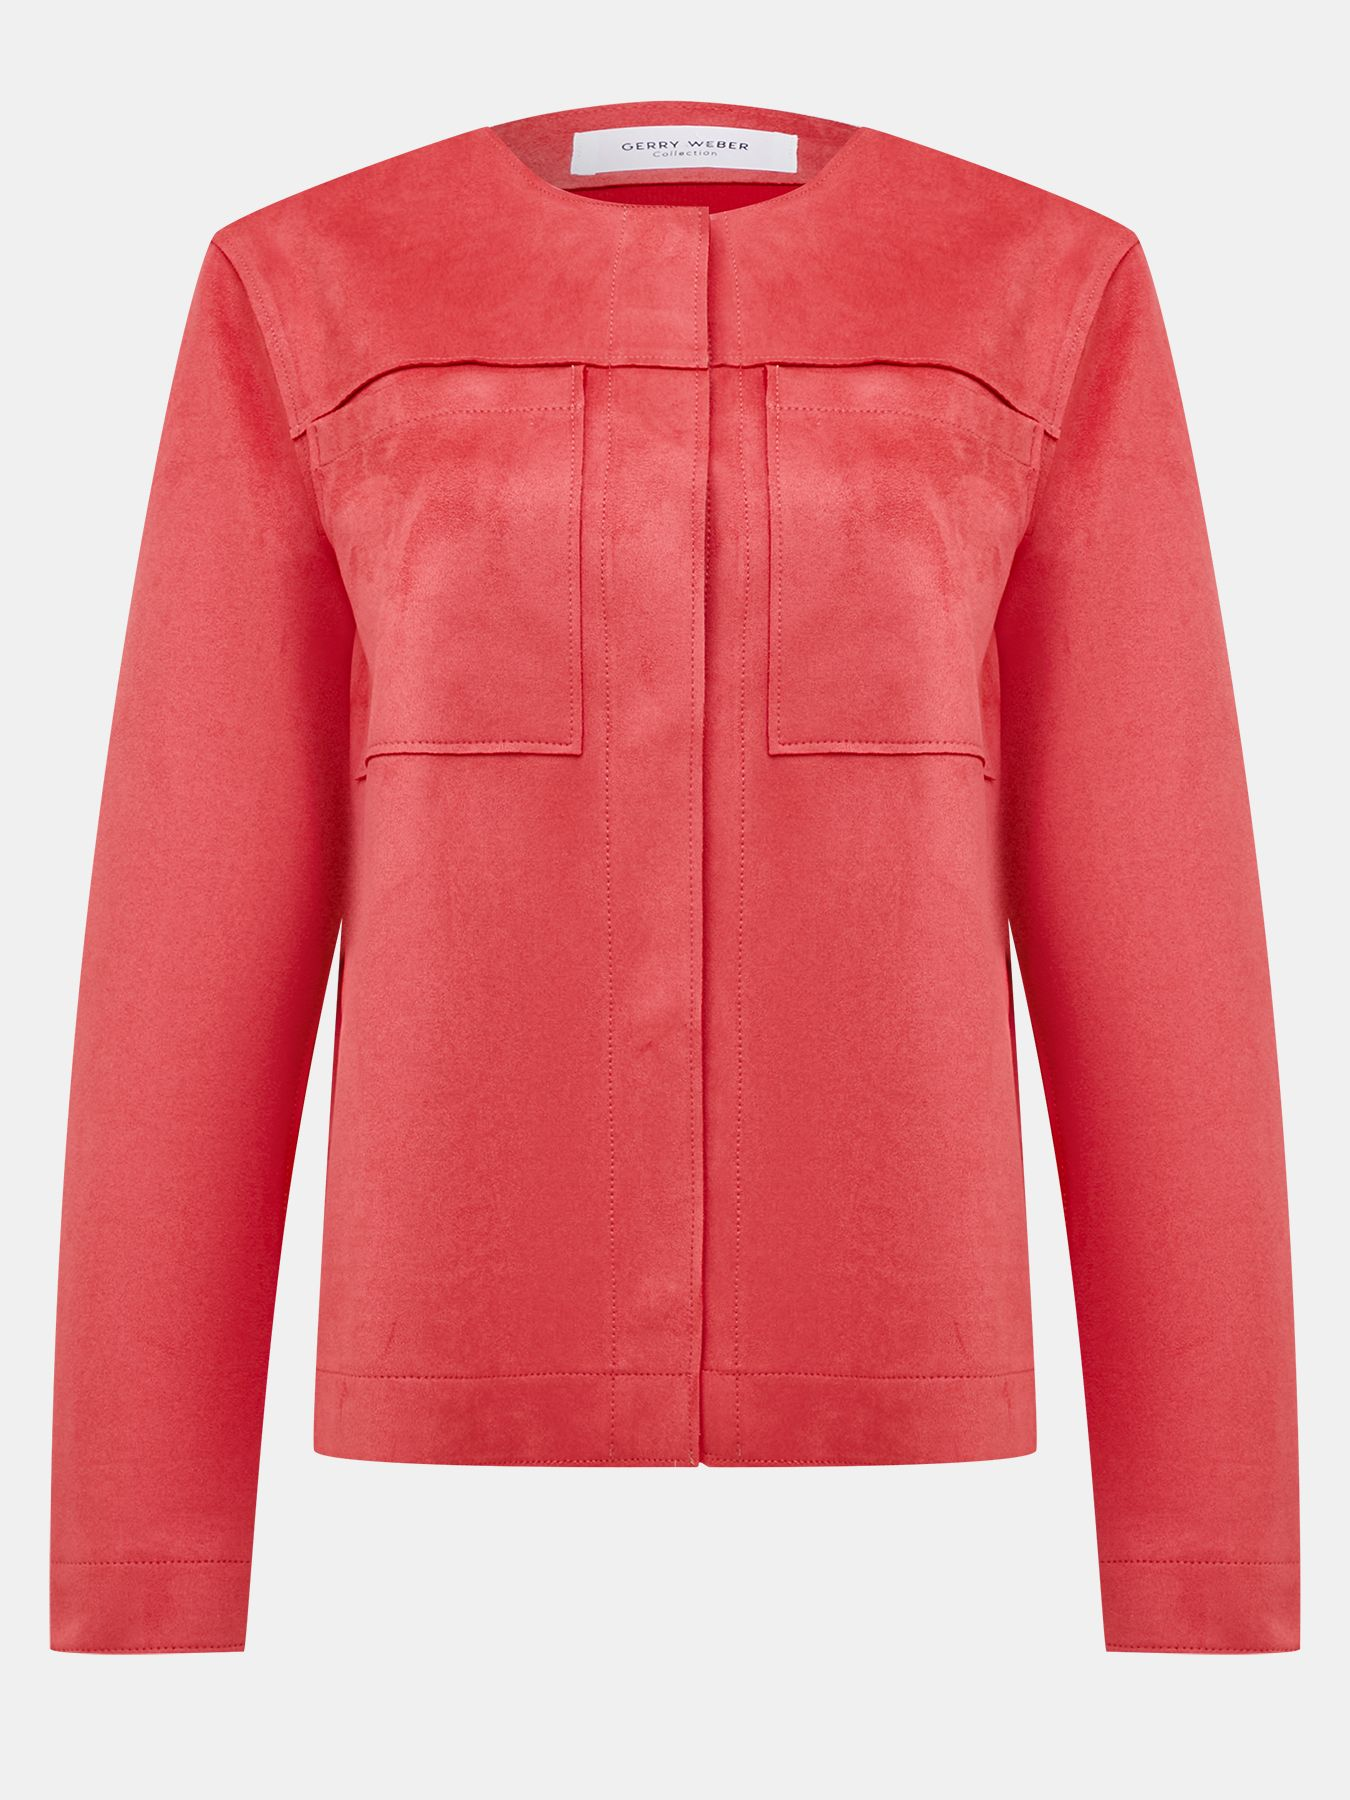 Фото - Куртки Gerry Weber Легкая куртка куртка утепленная jorg weber jorg weber mp002xm0yi6y